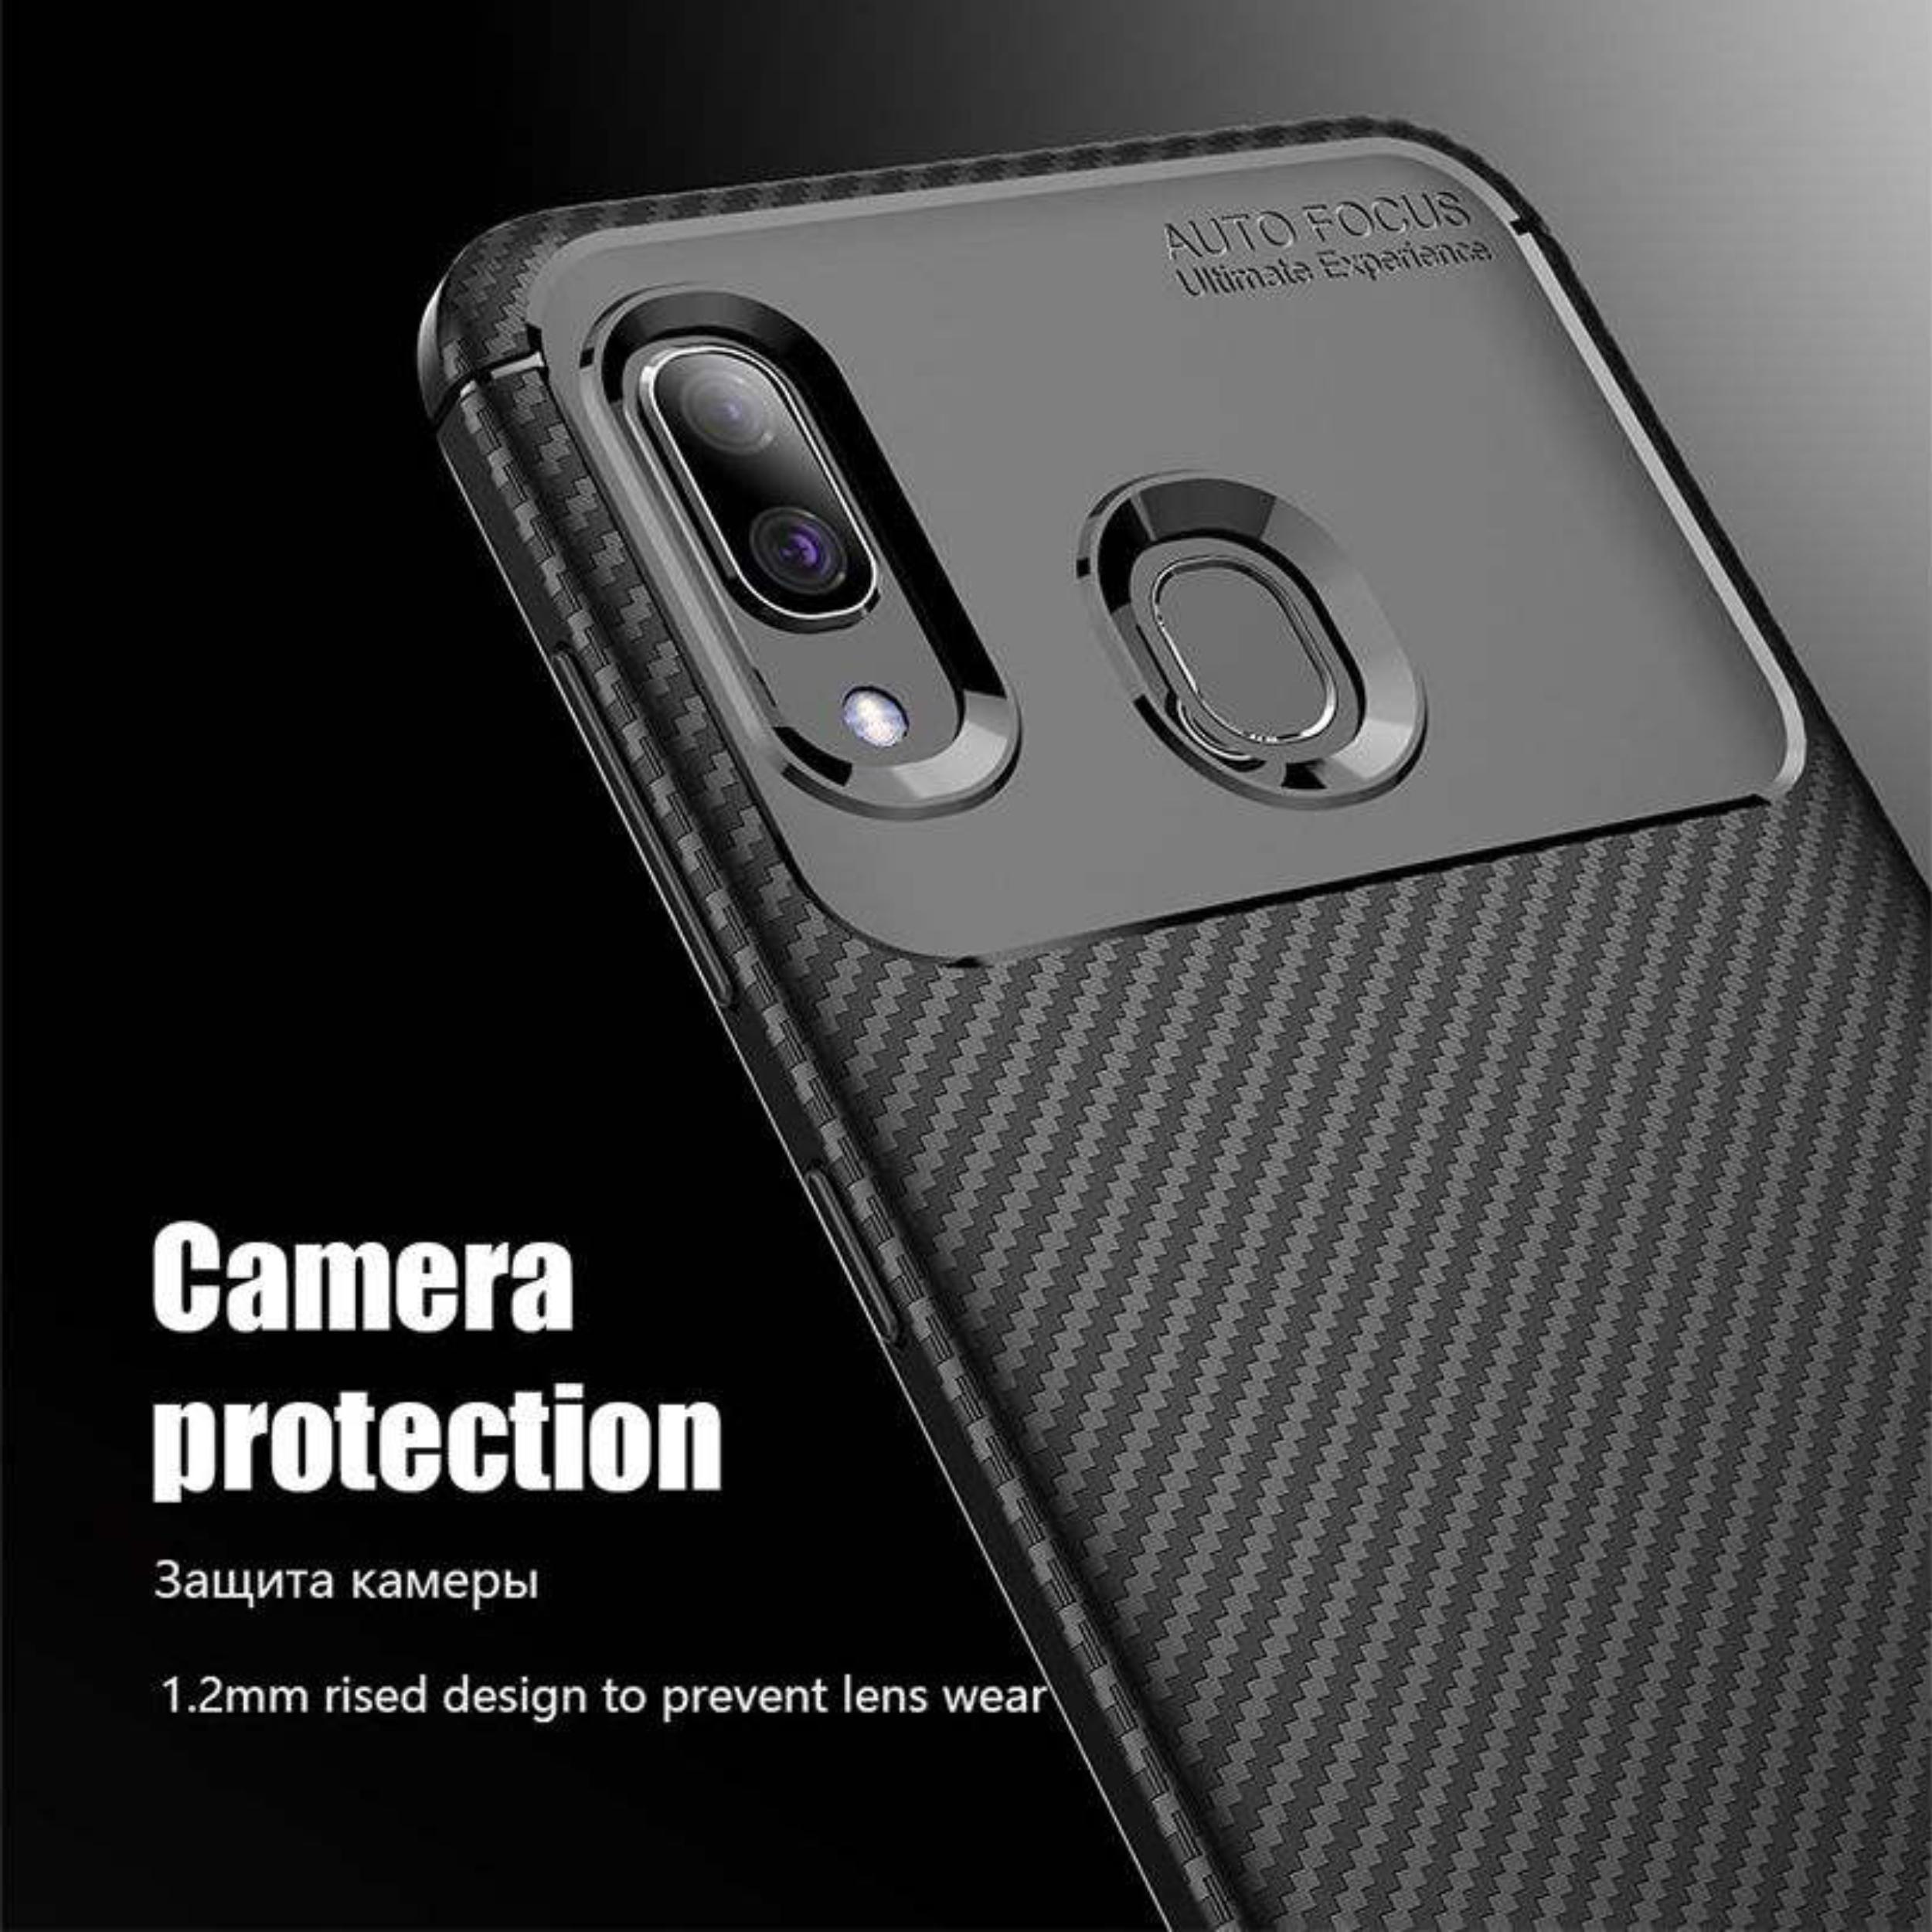 کاور لاین کینگ مدل A21 مناسب برای گوشی موبایل سامسونگ Galaxy A20/ A30/M10s thumb 2 9